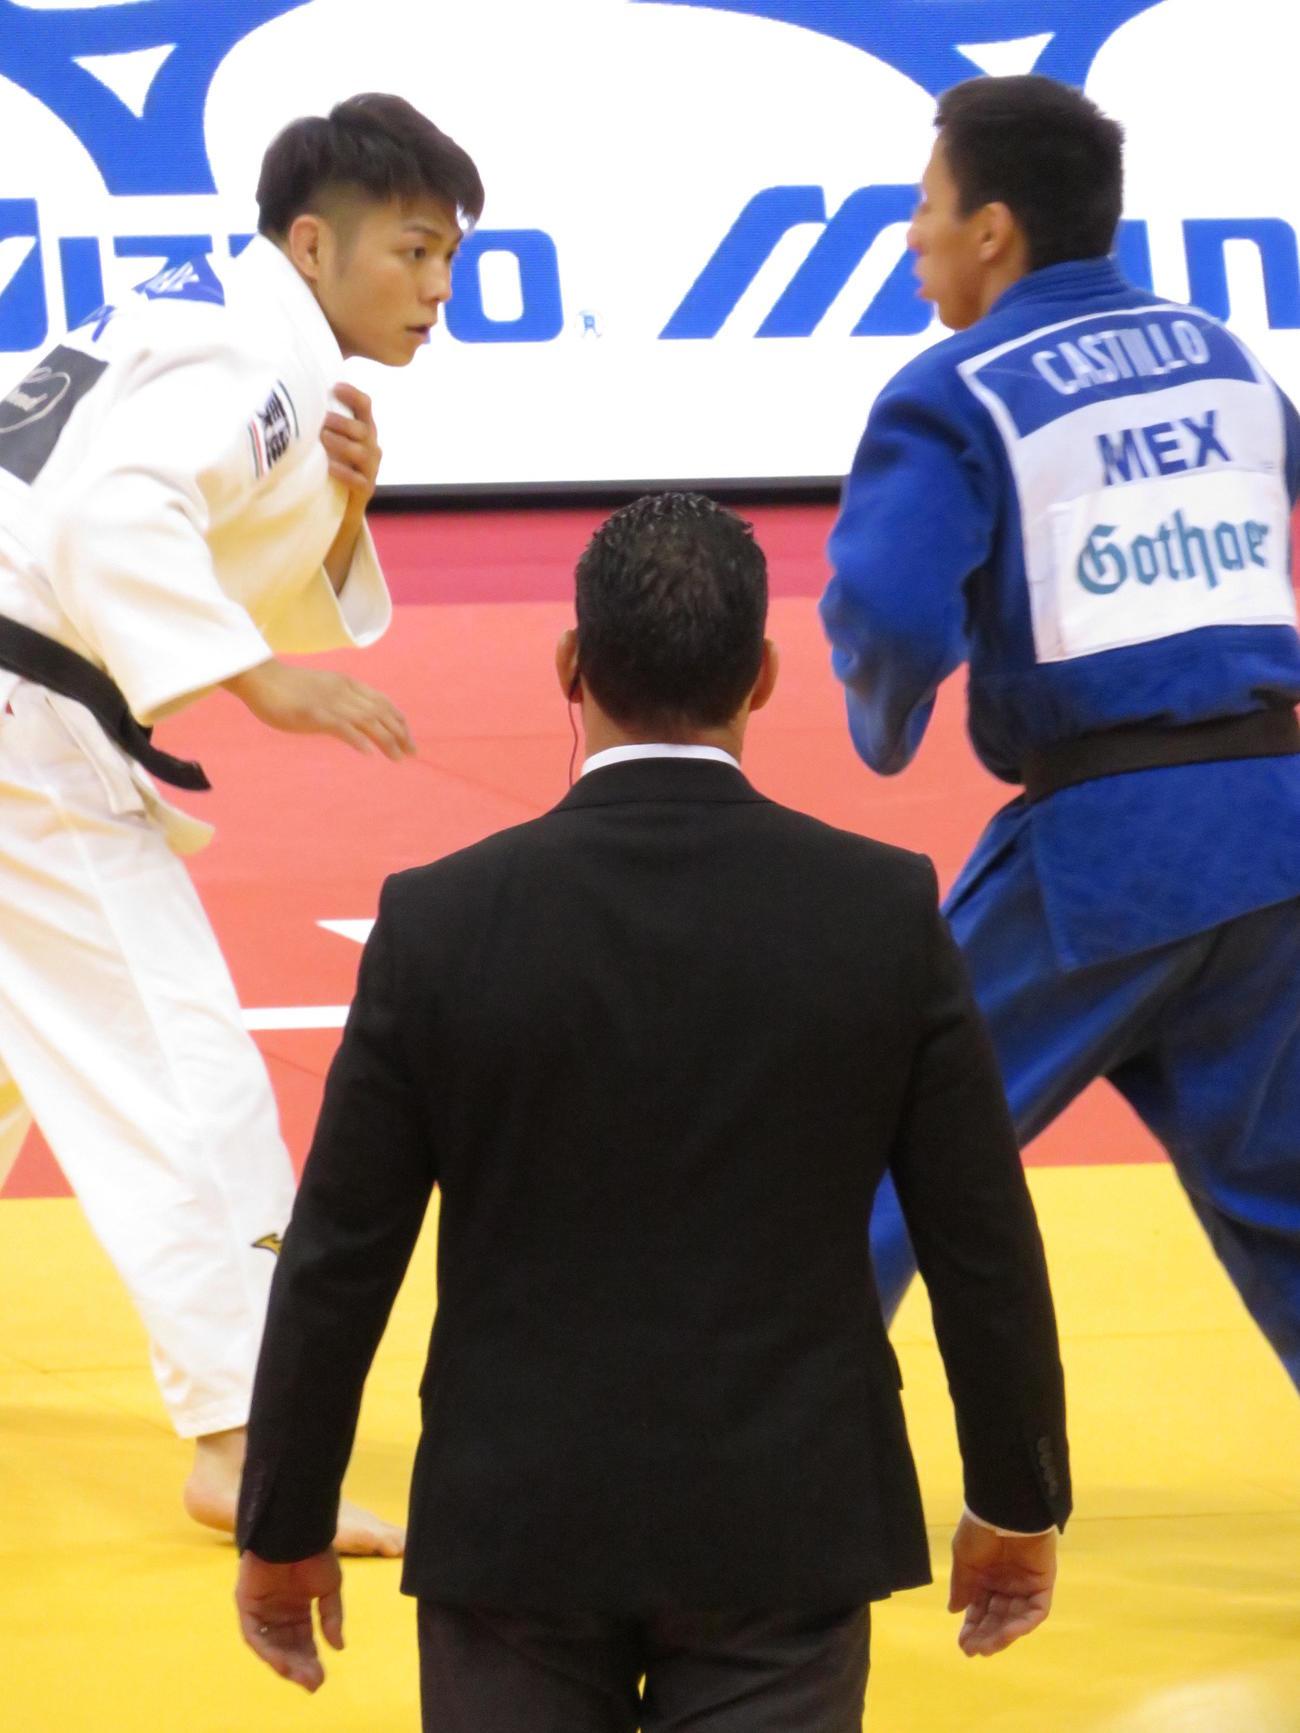 GSデュッセルドルフ大会3回戦でメキシコ選手と対戦する阿部一二三(撮影・峯岸佑樹)